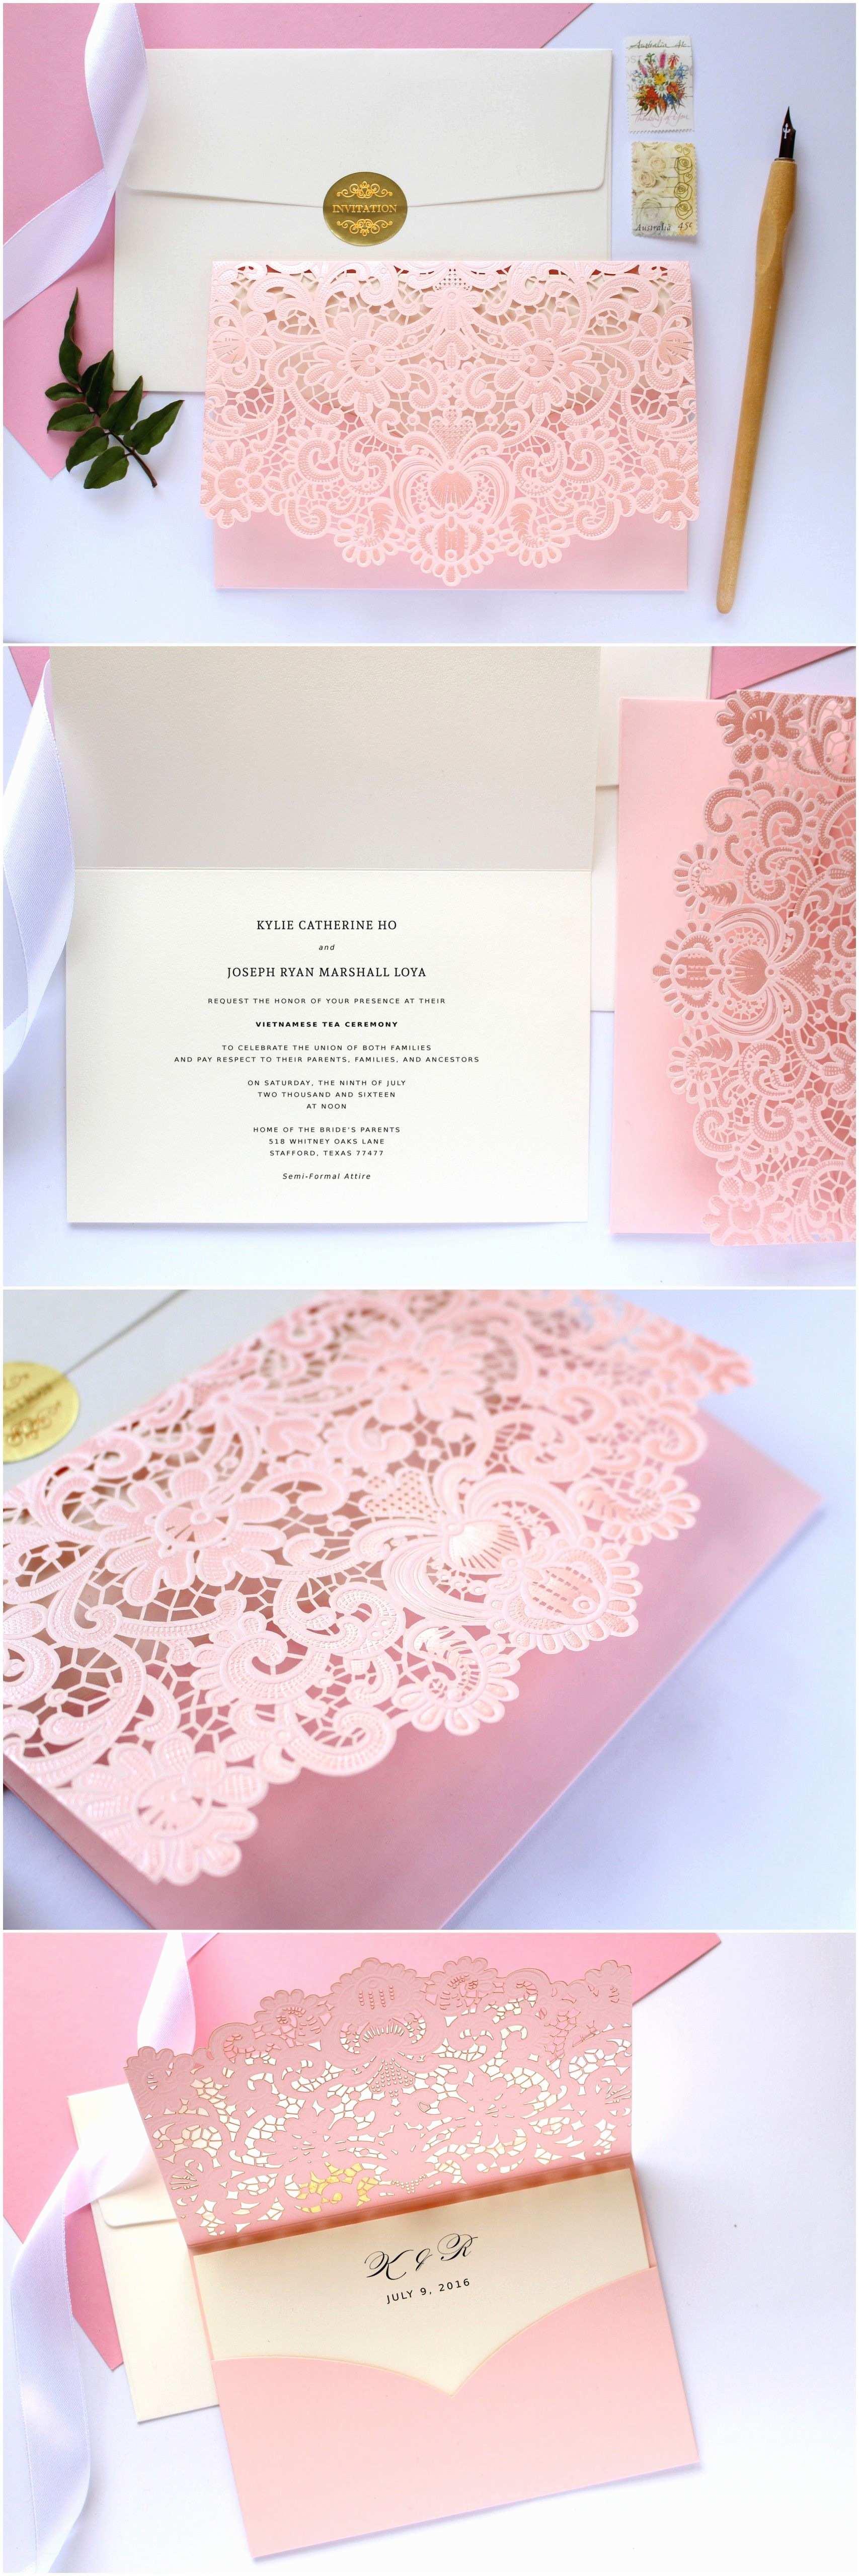 Quinceanera Invitations Blush Pink Laser Cut Wedding Invitation How Pretty